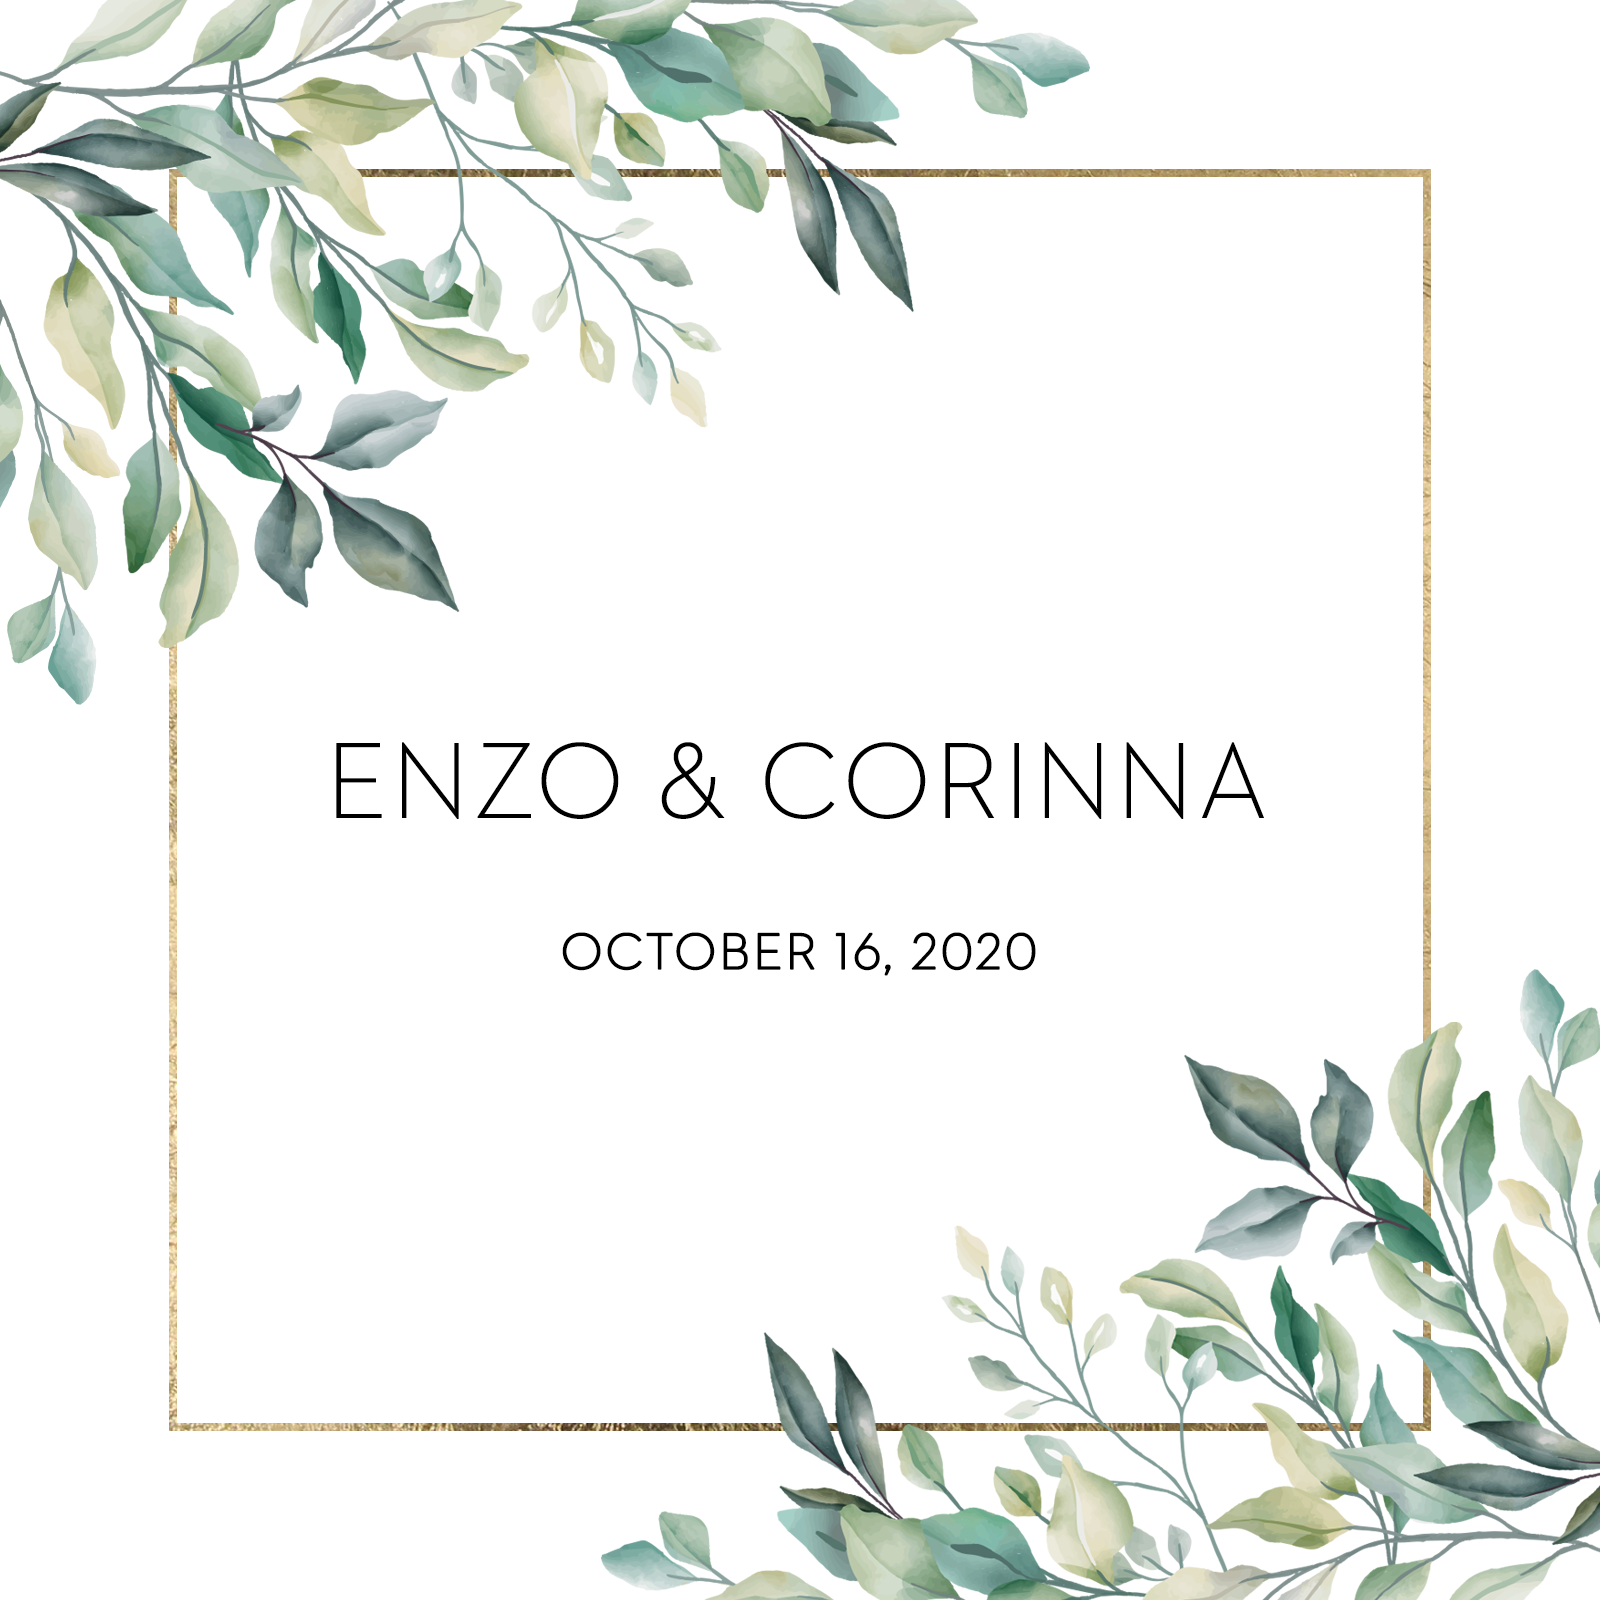 enzo-corinna01_splash